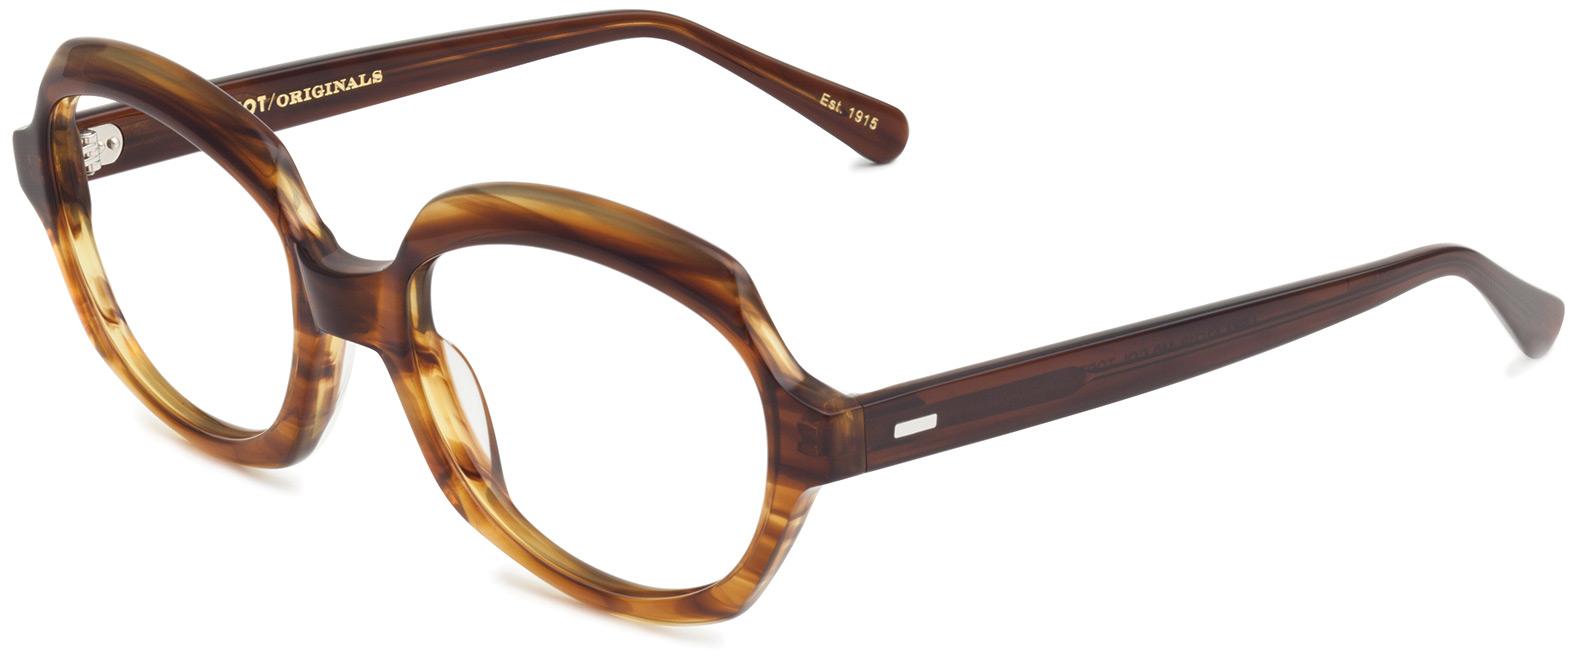 moscot-eyewear-ss2013-16